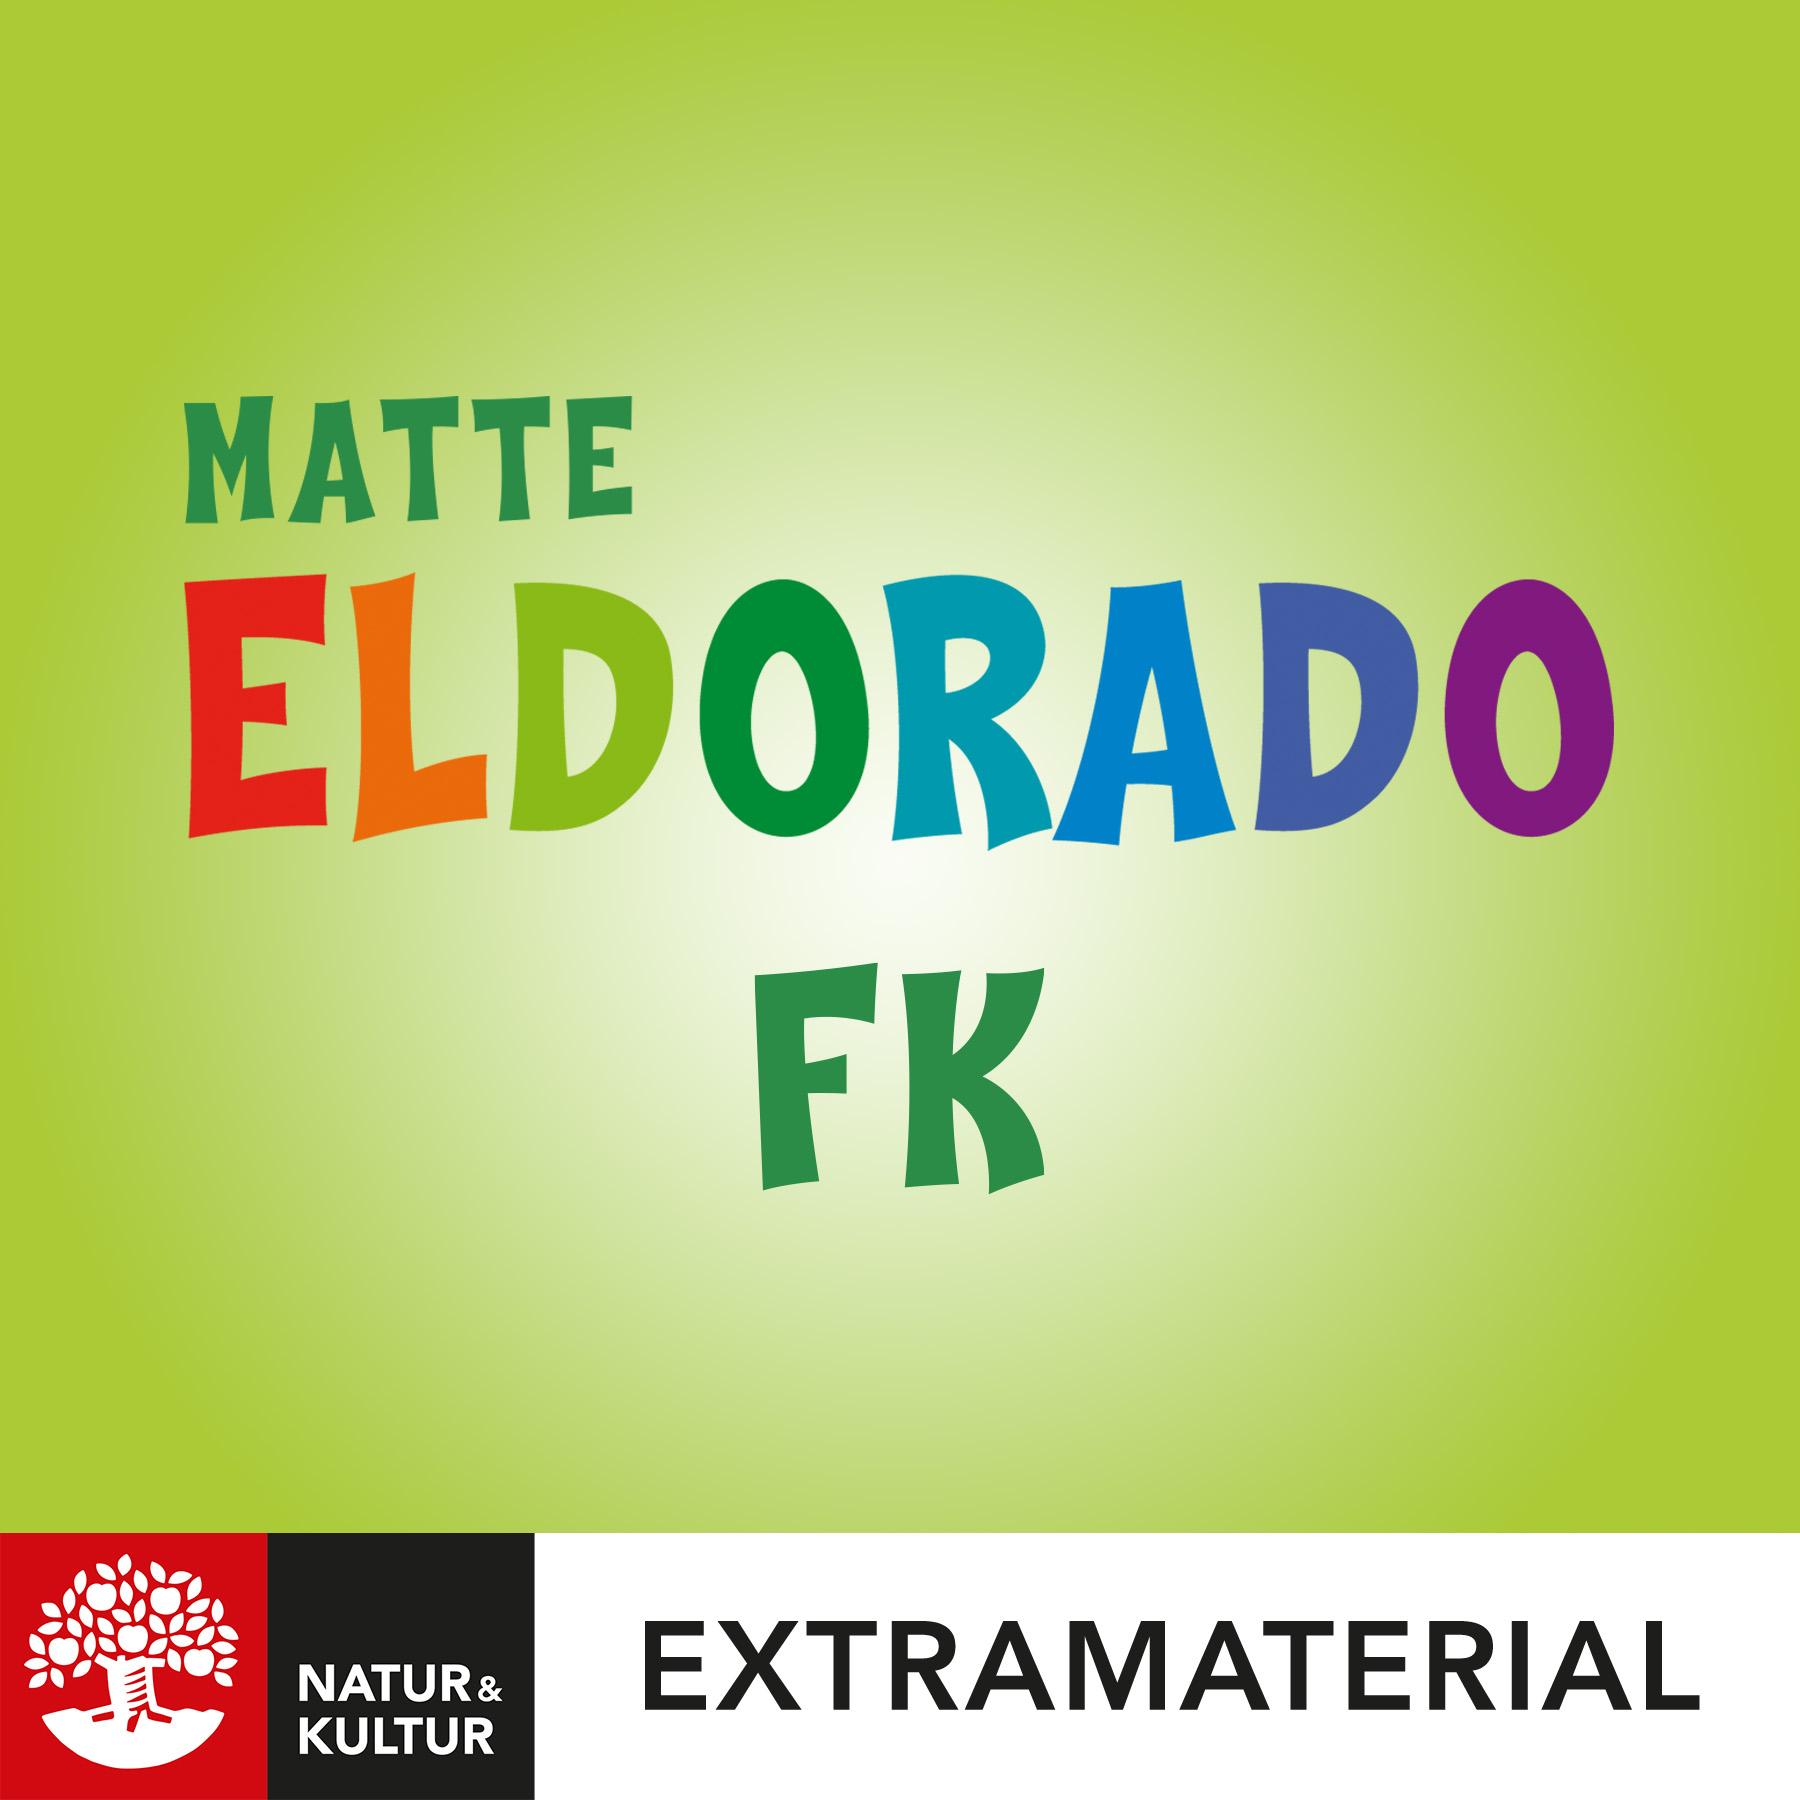 Eldorado FK